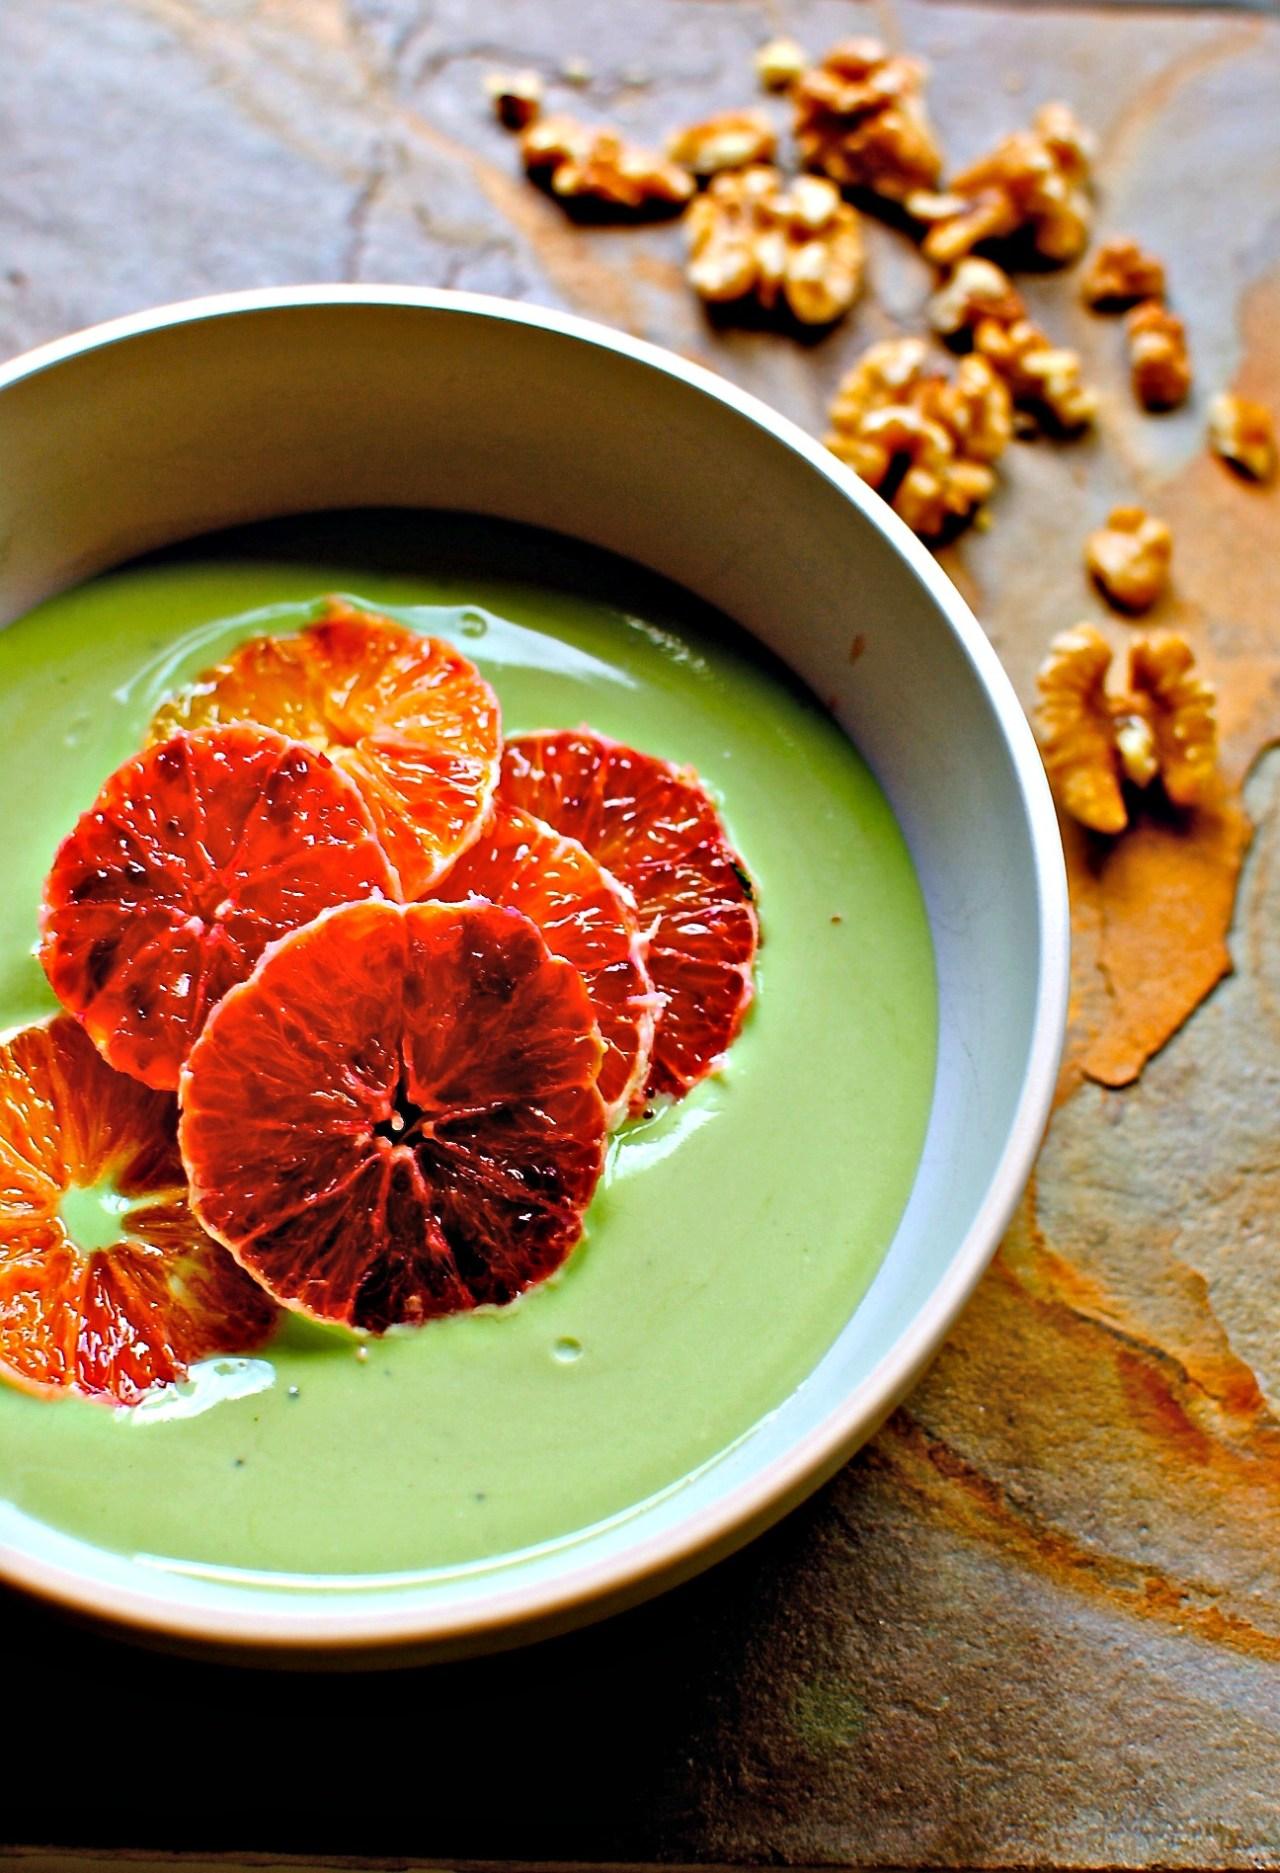 #matcha #greentea #yogurt #breakfast bowl